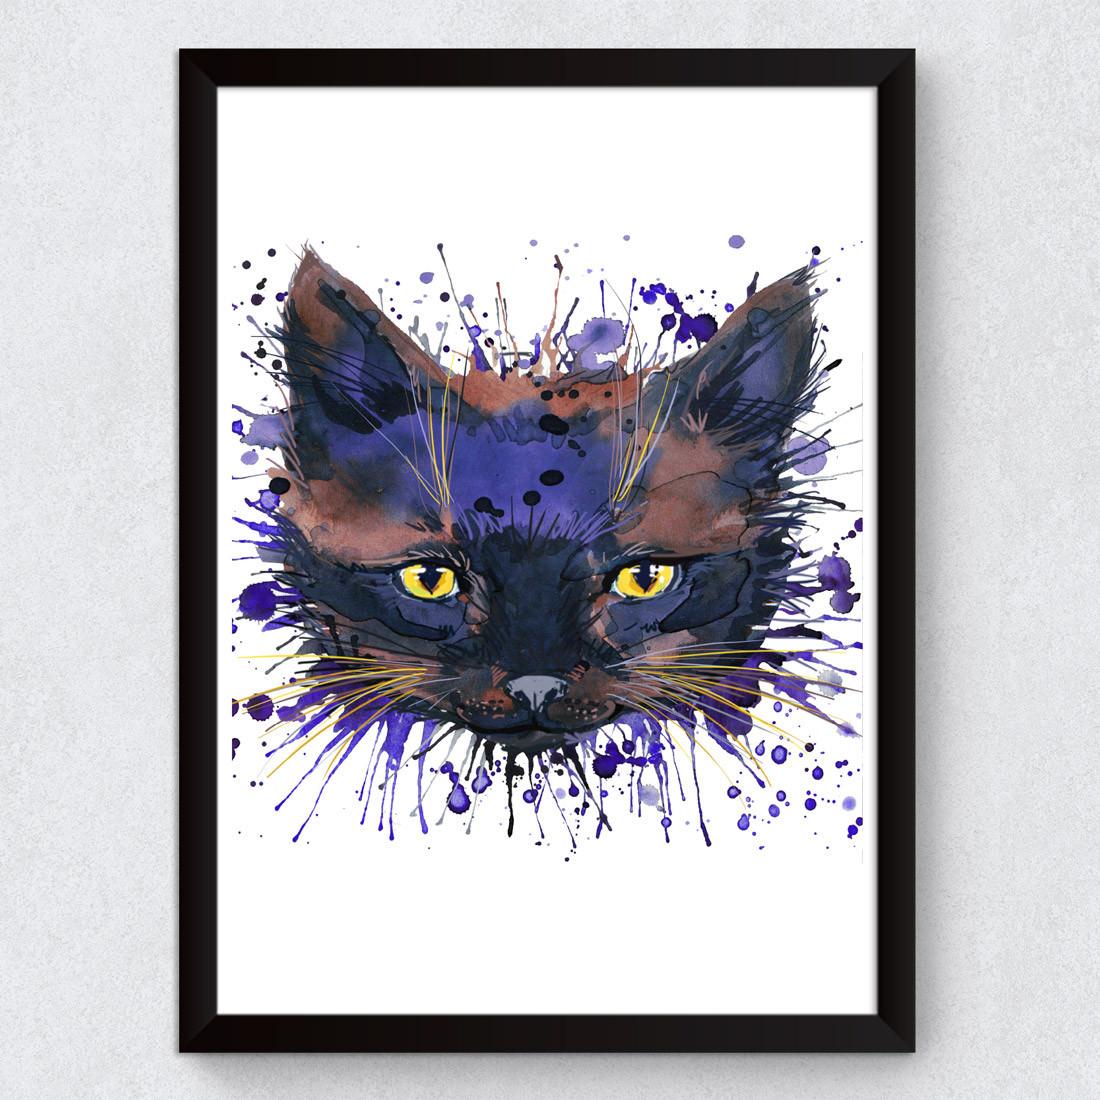 Quadro Decorativo Cat Preto Aquarela